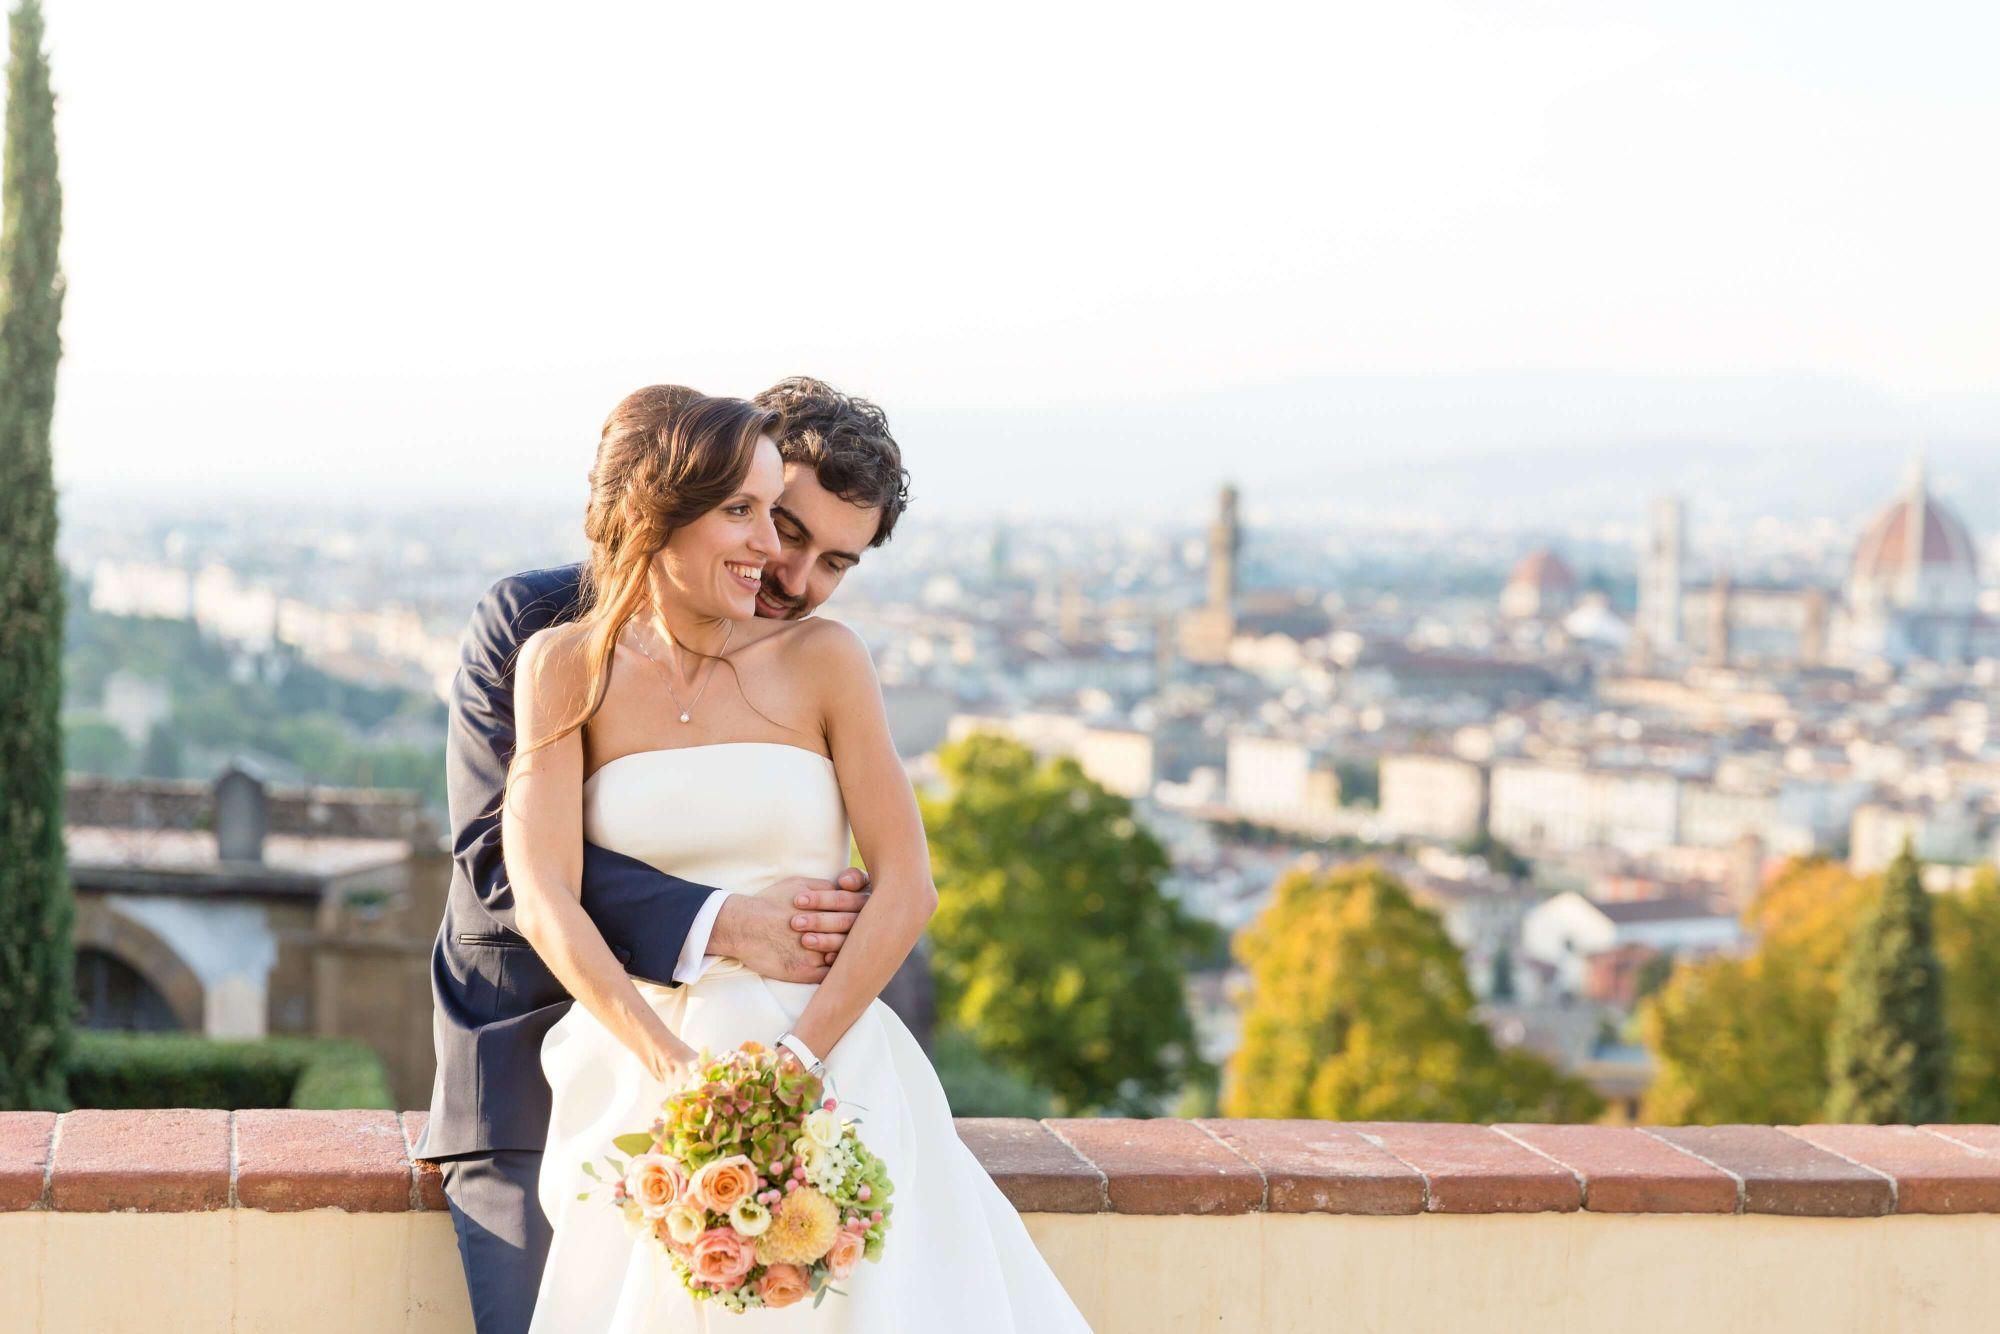 matrimonio E&J - San Miniato al Monte - Firenze - Toscana